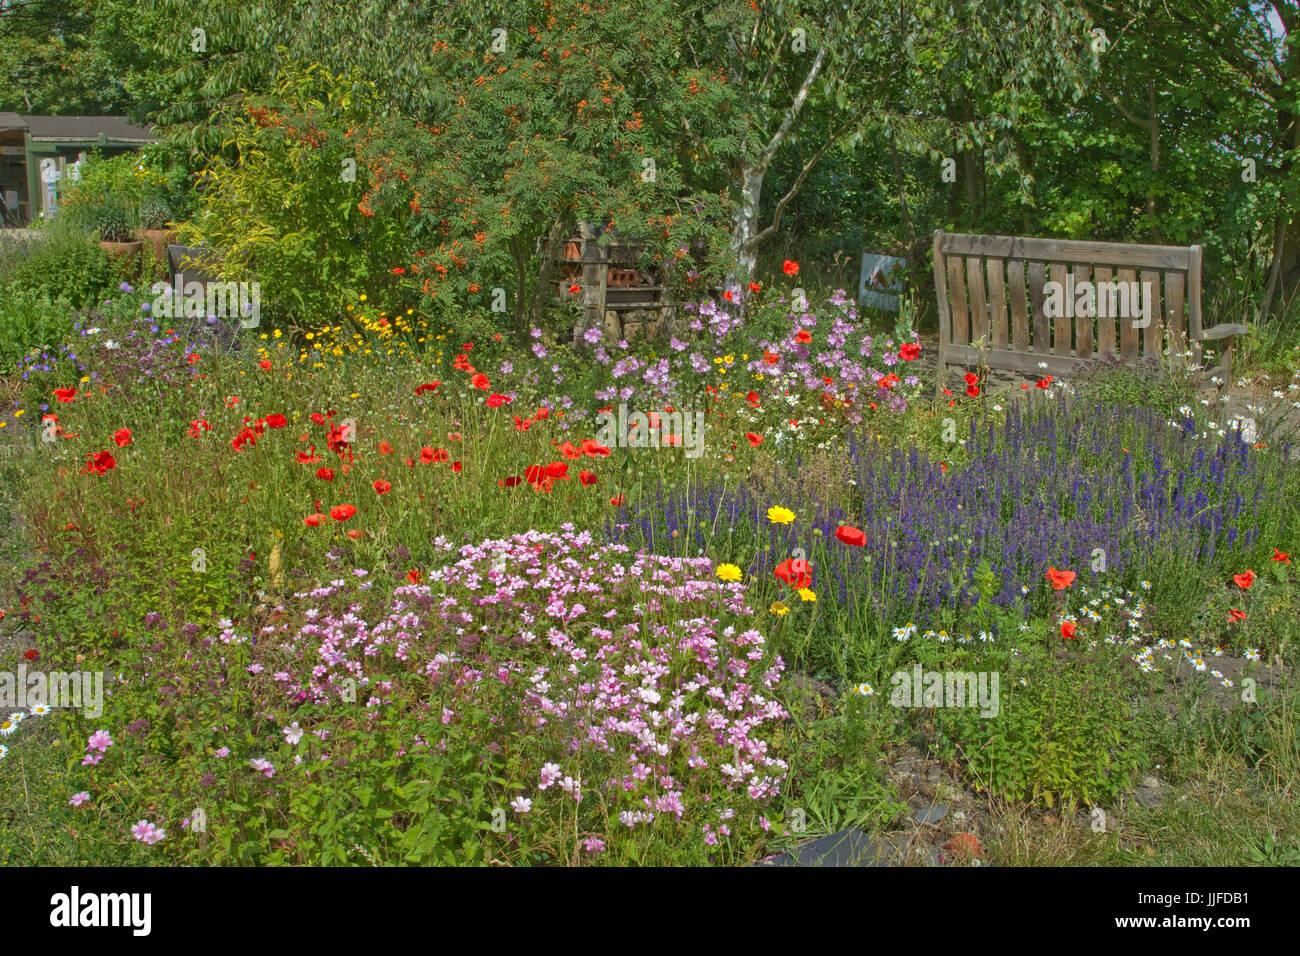 Wild summer flowers in a garden - Stock Image